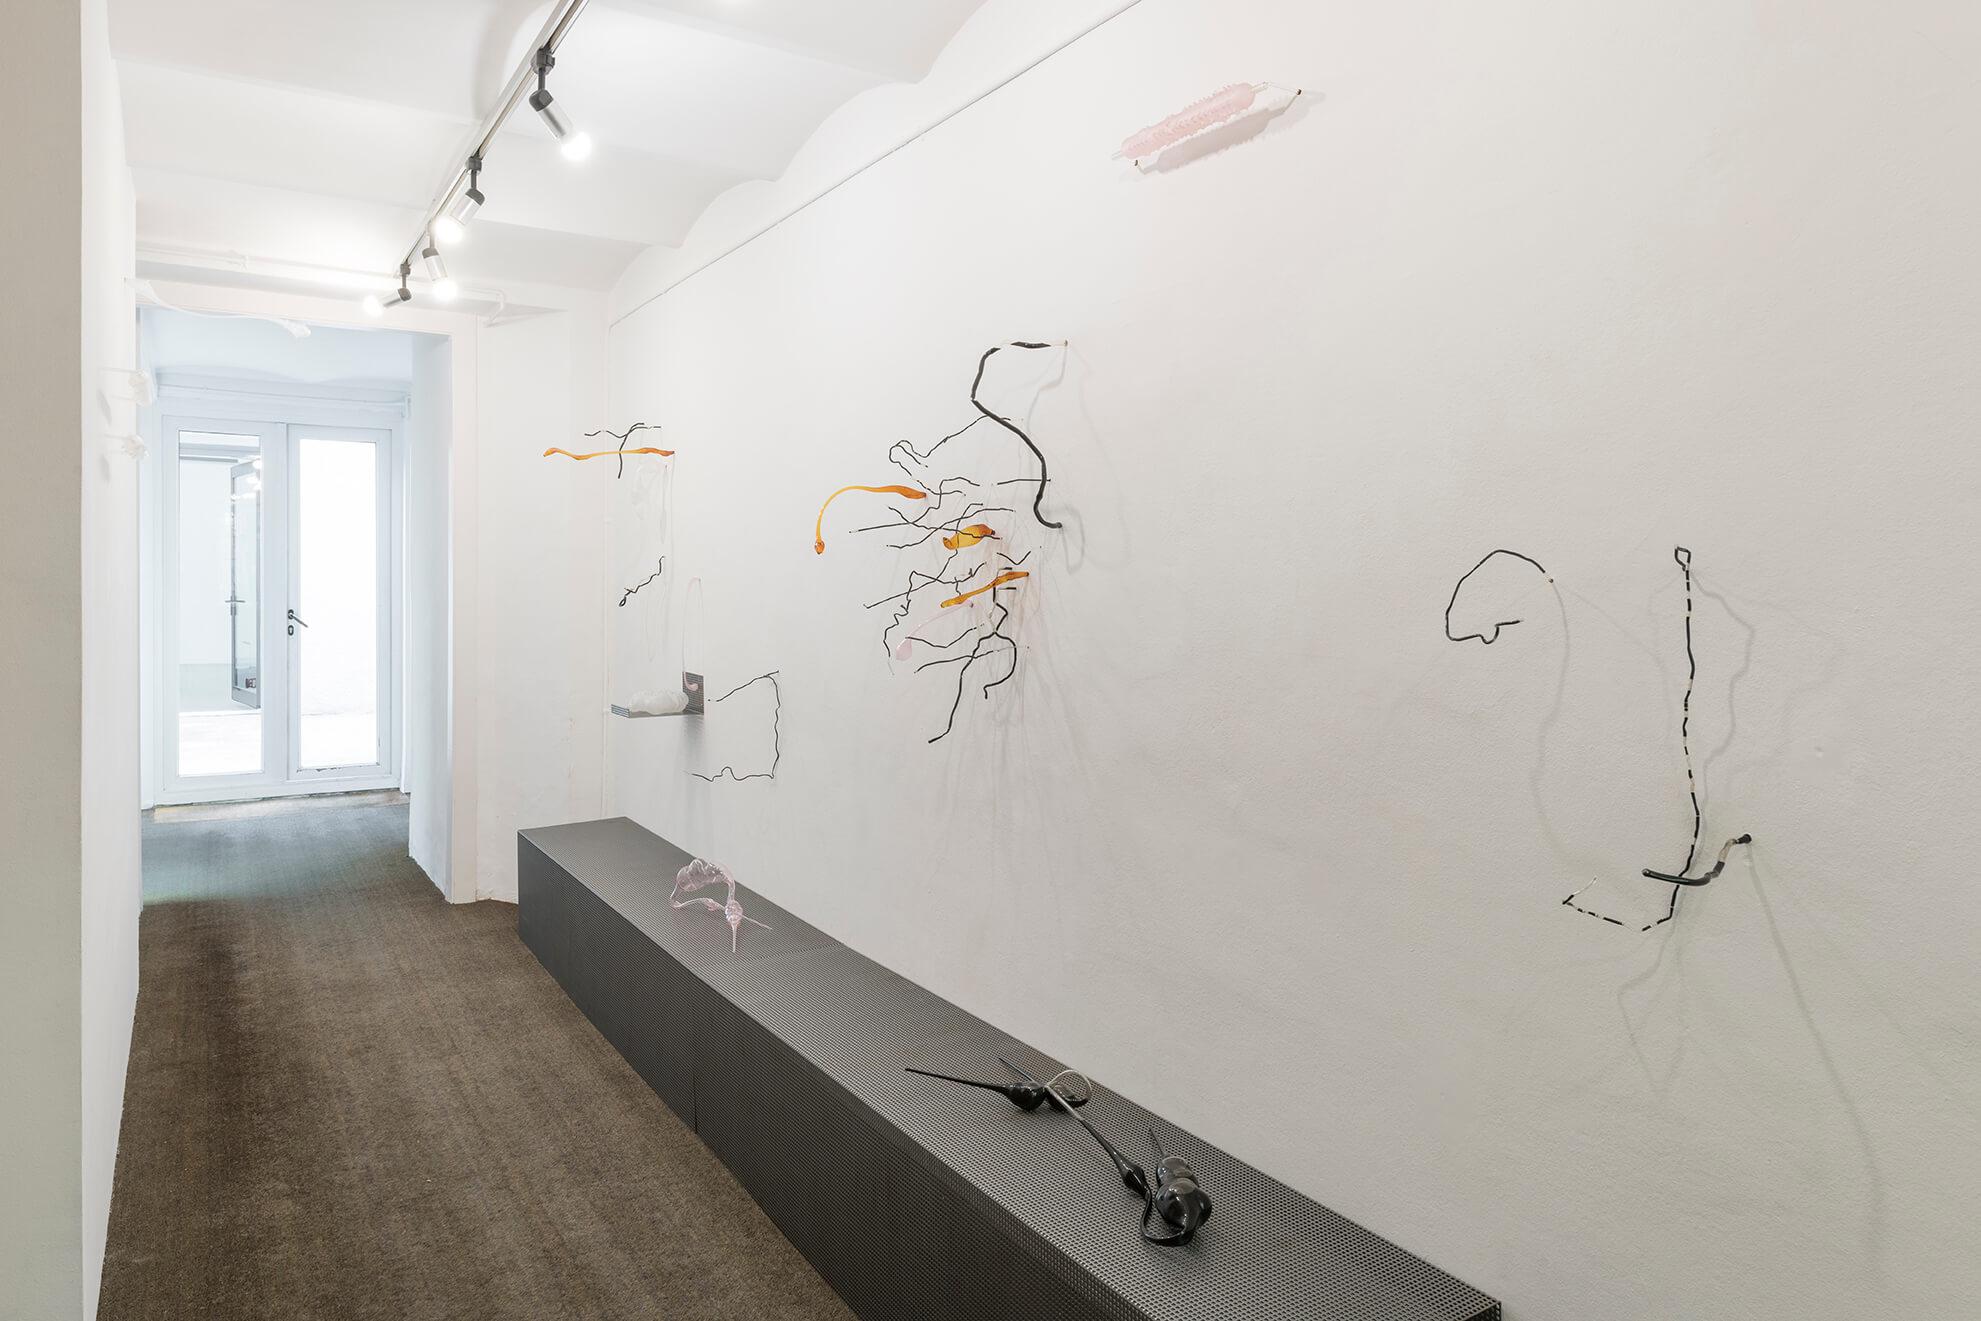 Installation view: Delu, ProjecteSD | Lara Fluxà: Delu / Accrochage #5: Set Petites Històries | ProjecteSD